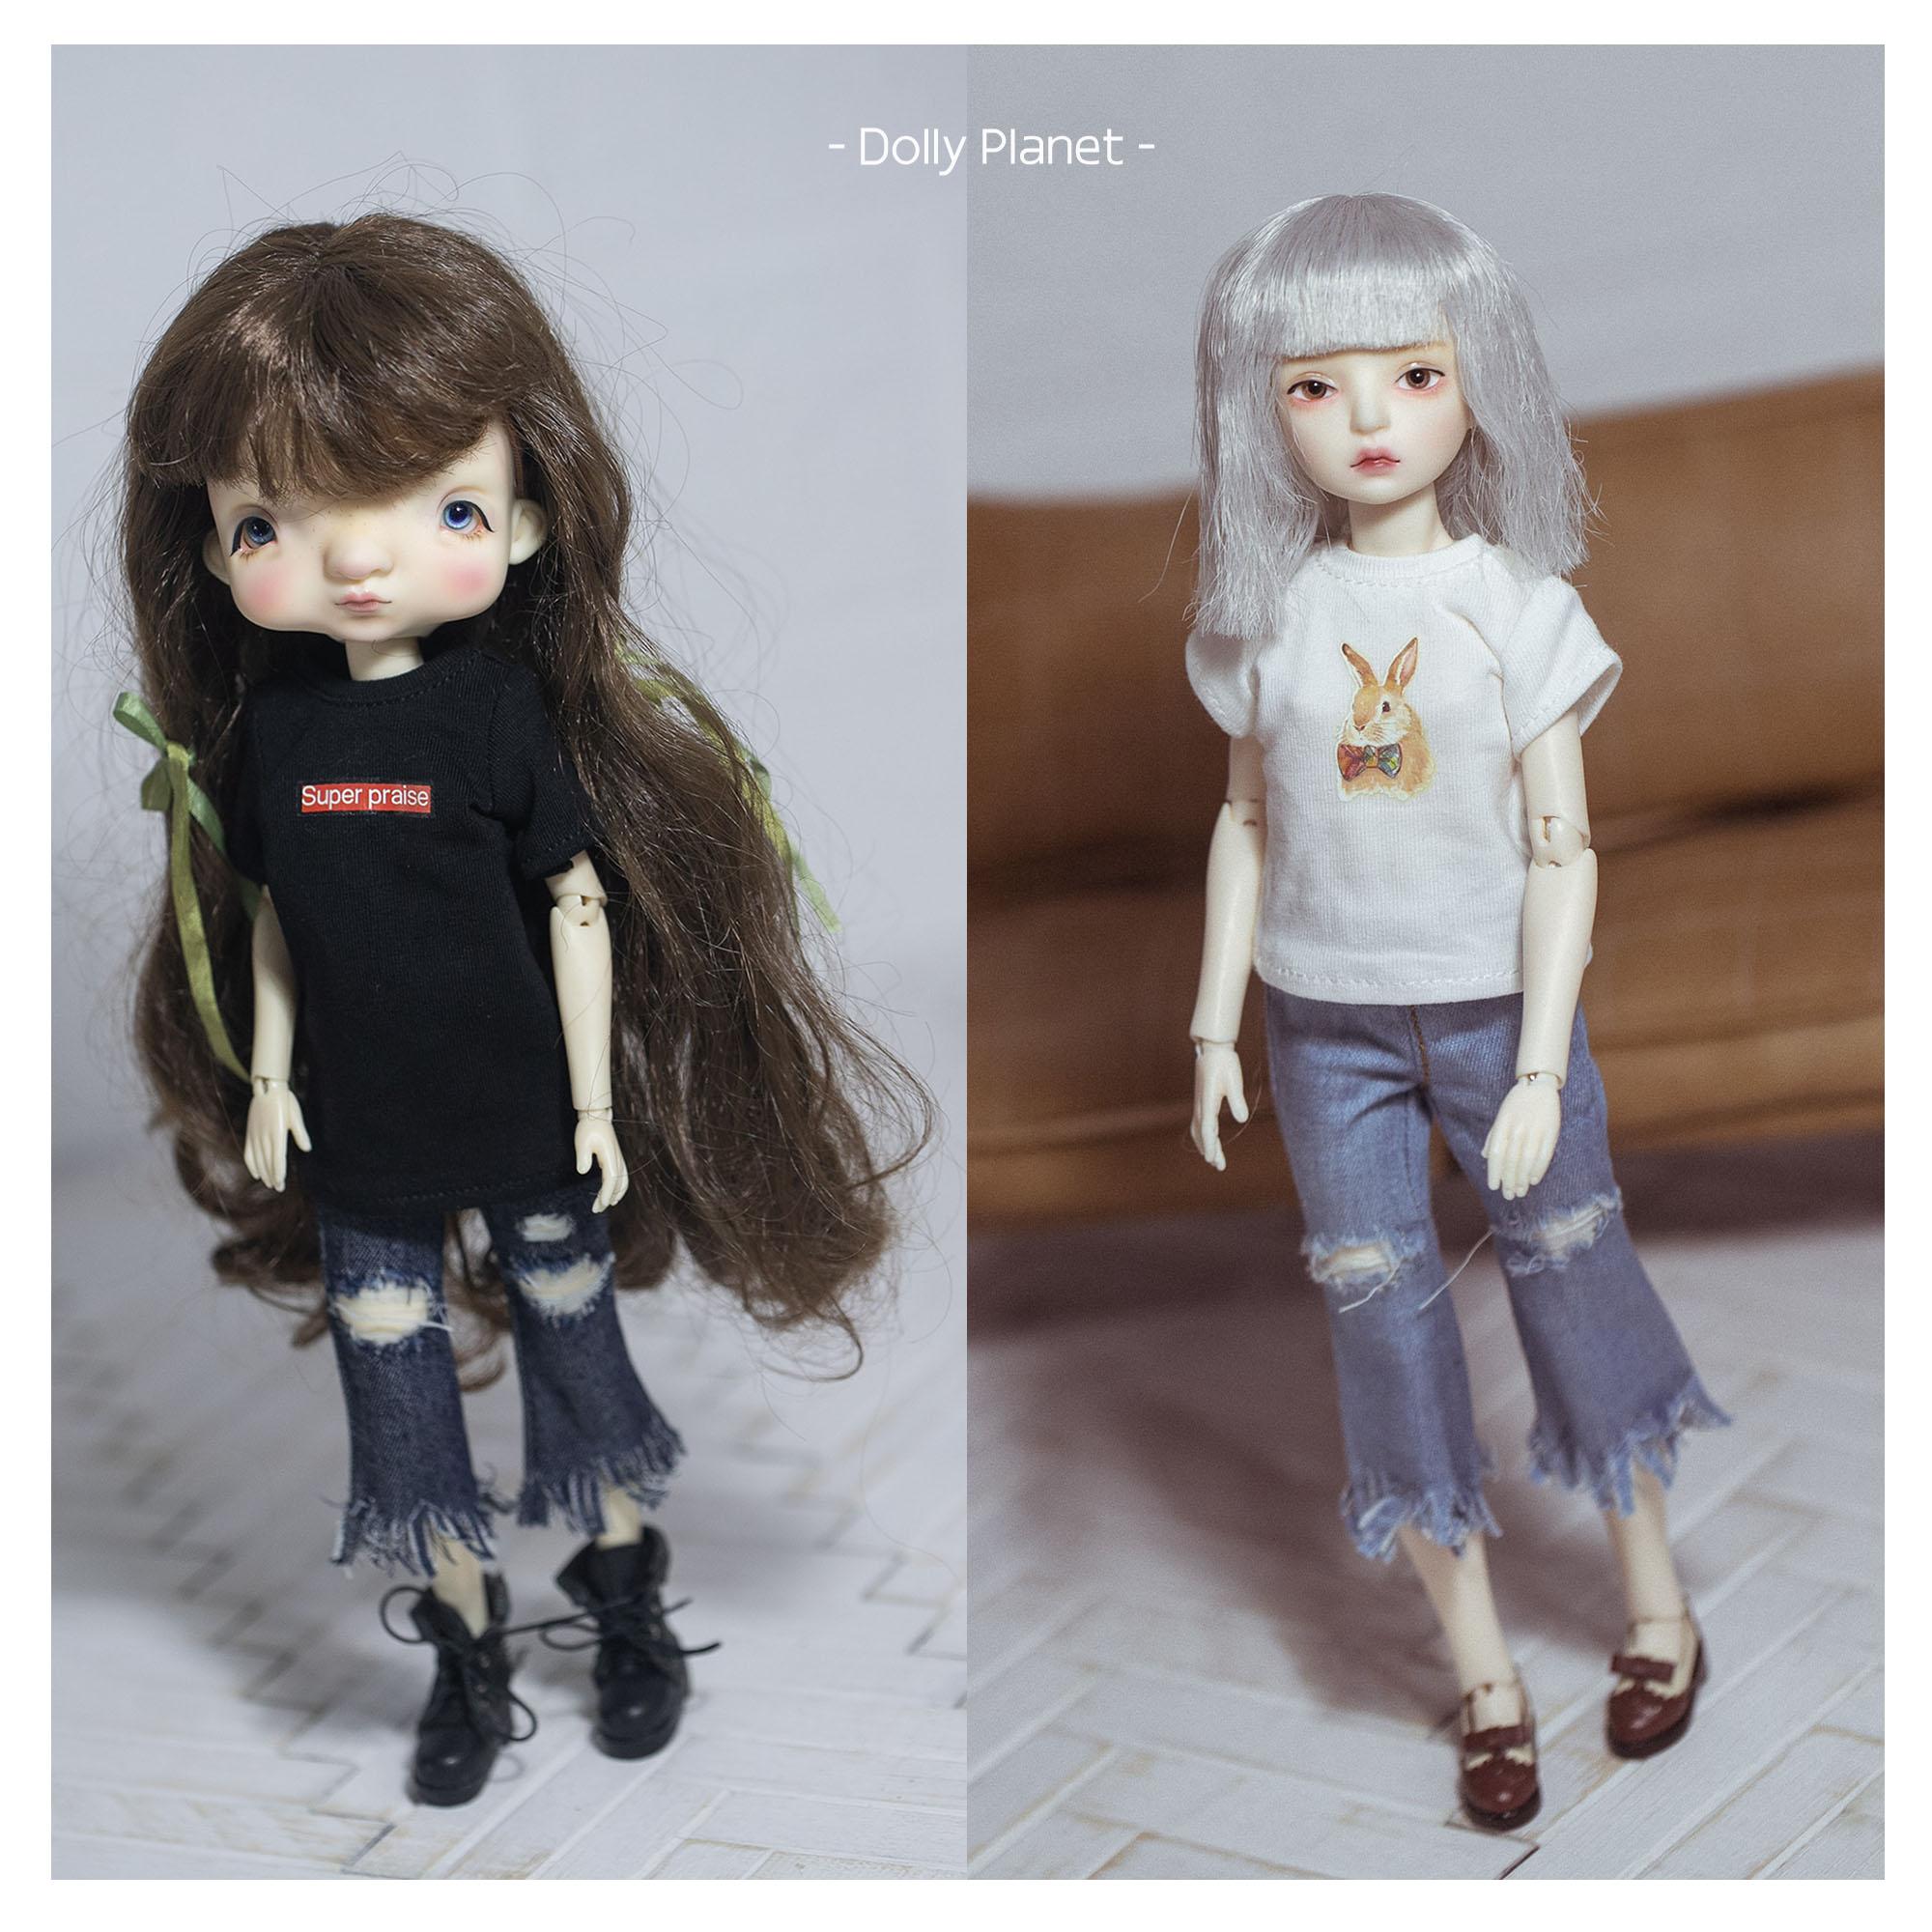 BO-05 Doll Ripped Jeans Blythe/OB24/Licca